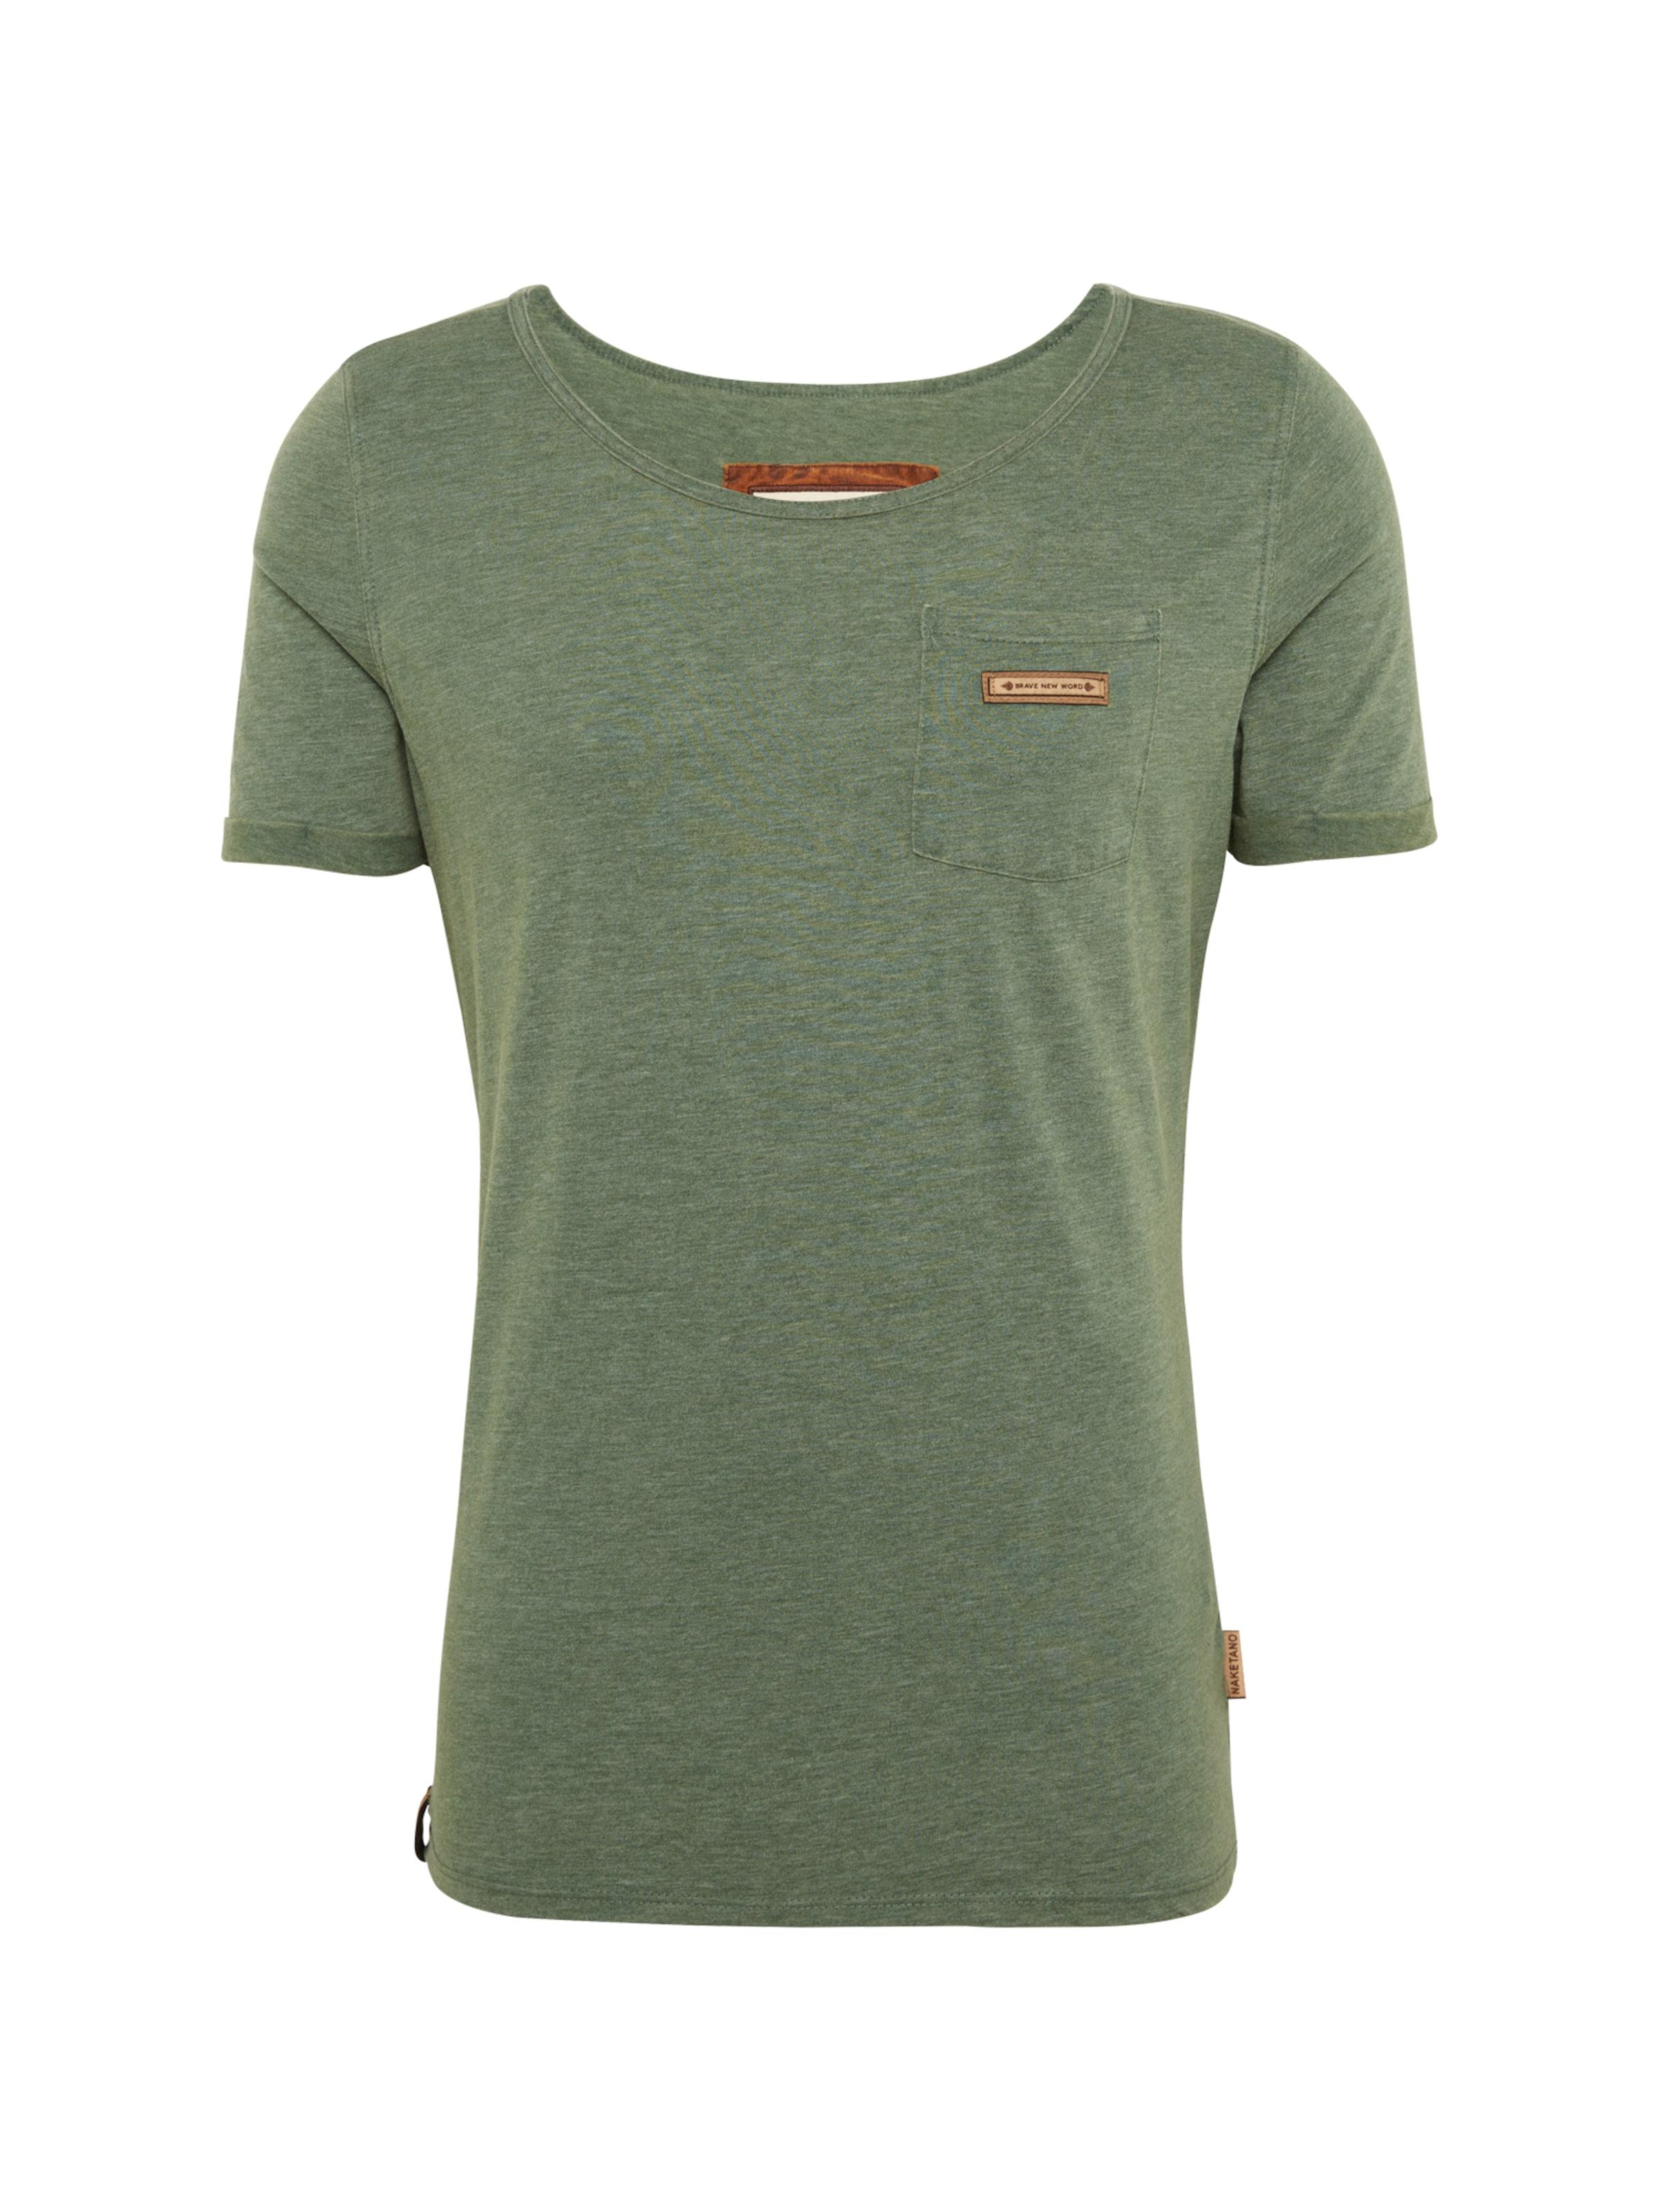 Tanne shirt T 'fashionopfa' Naketano In 0wvmn8N